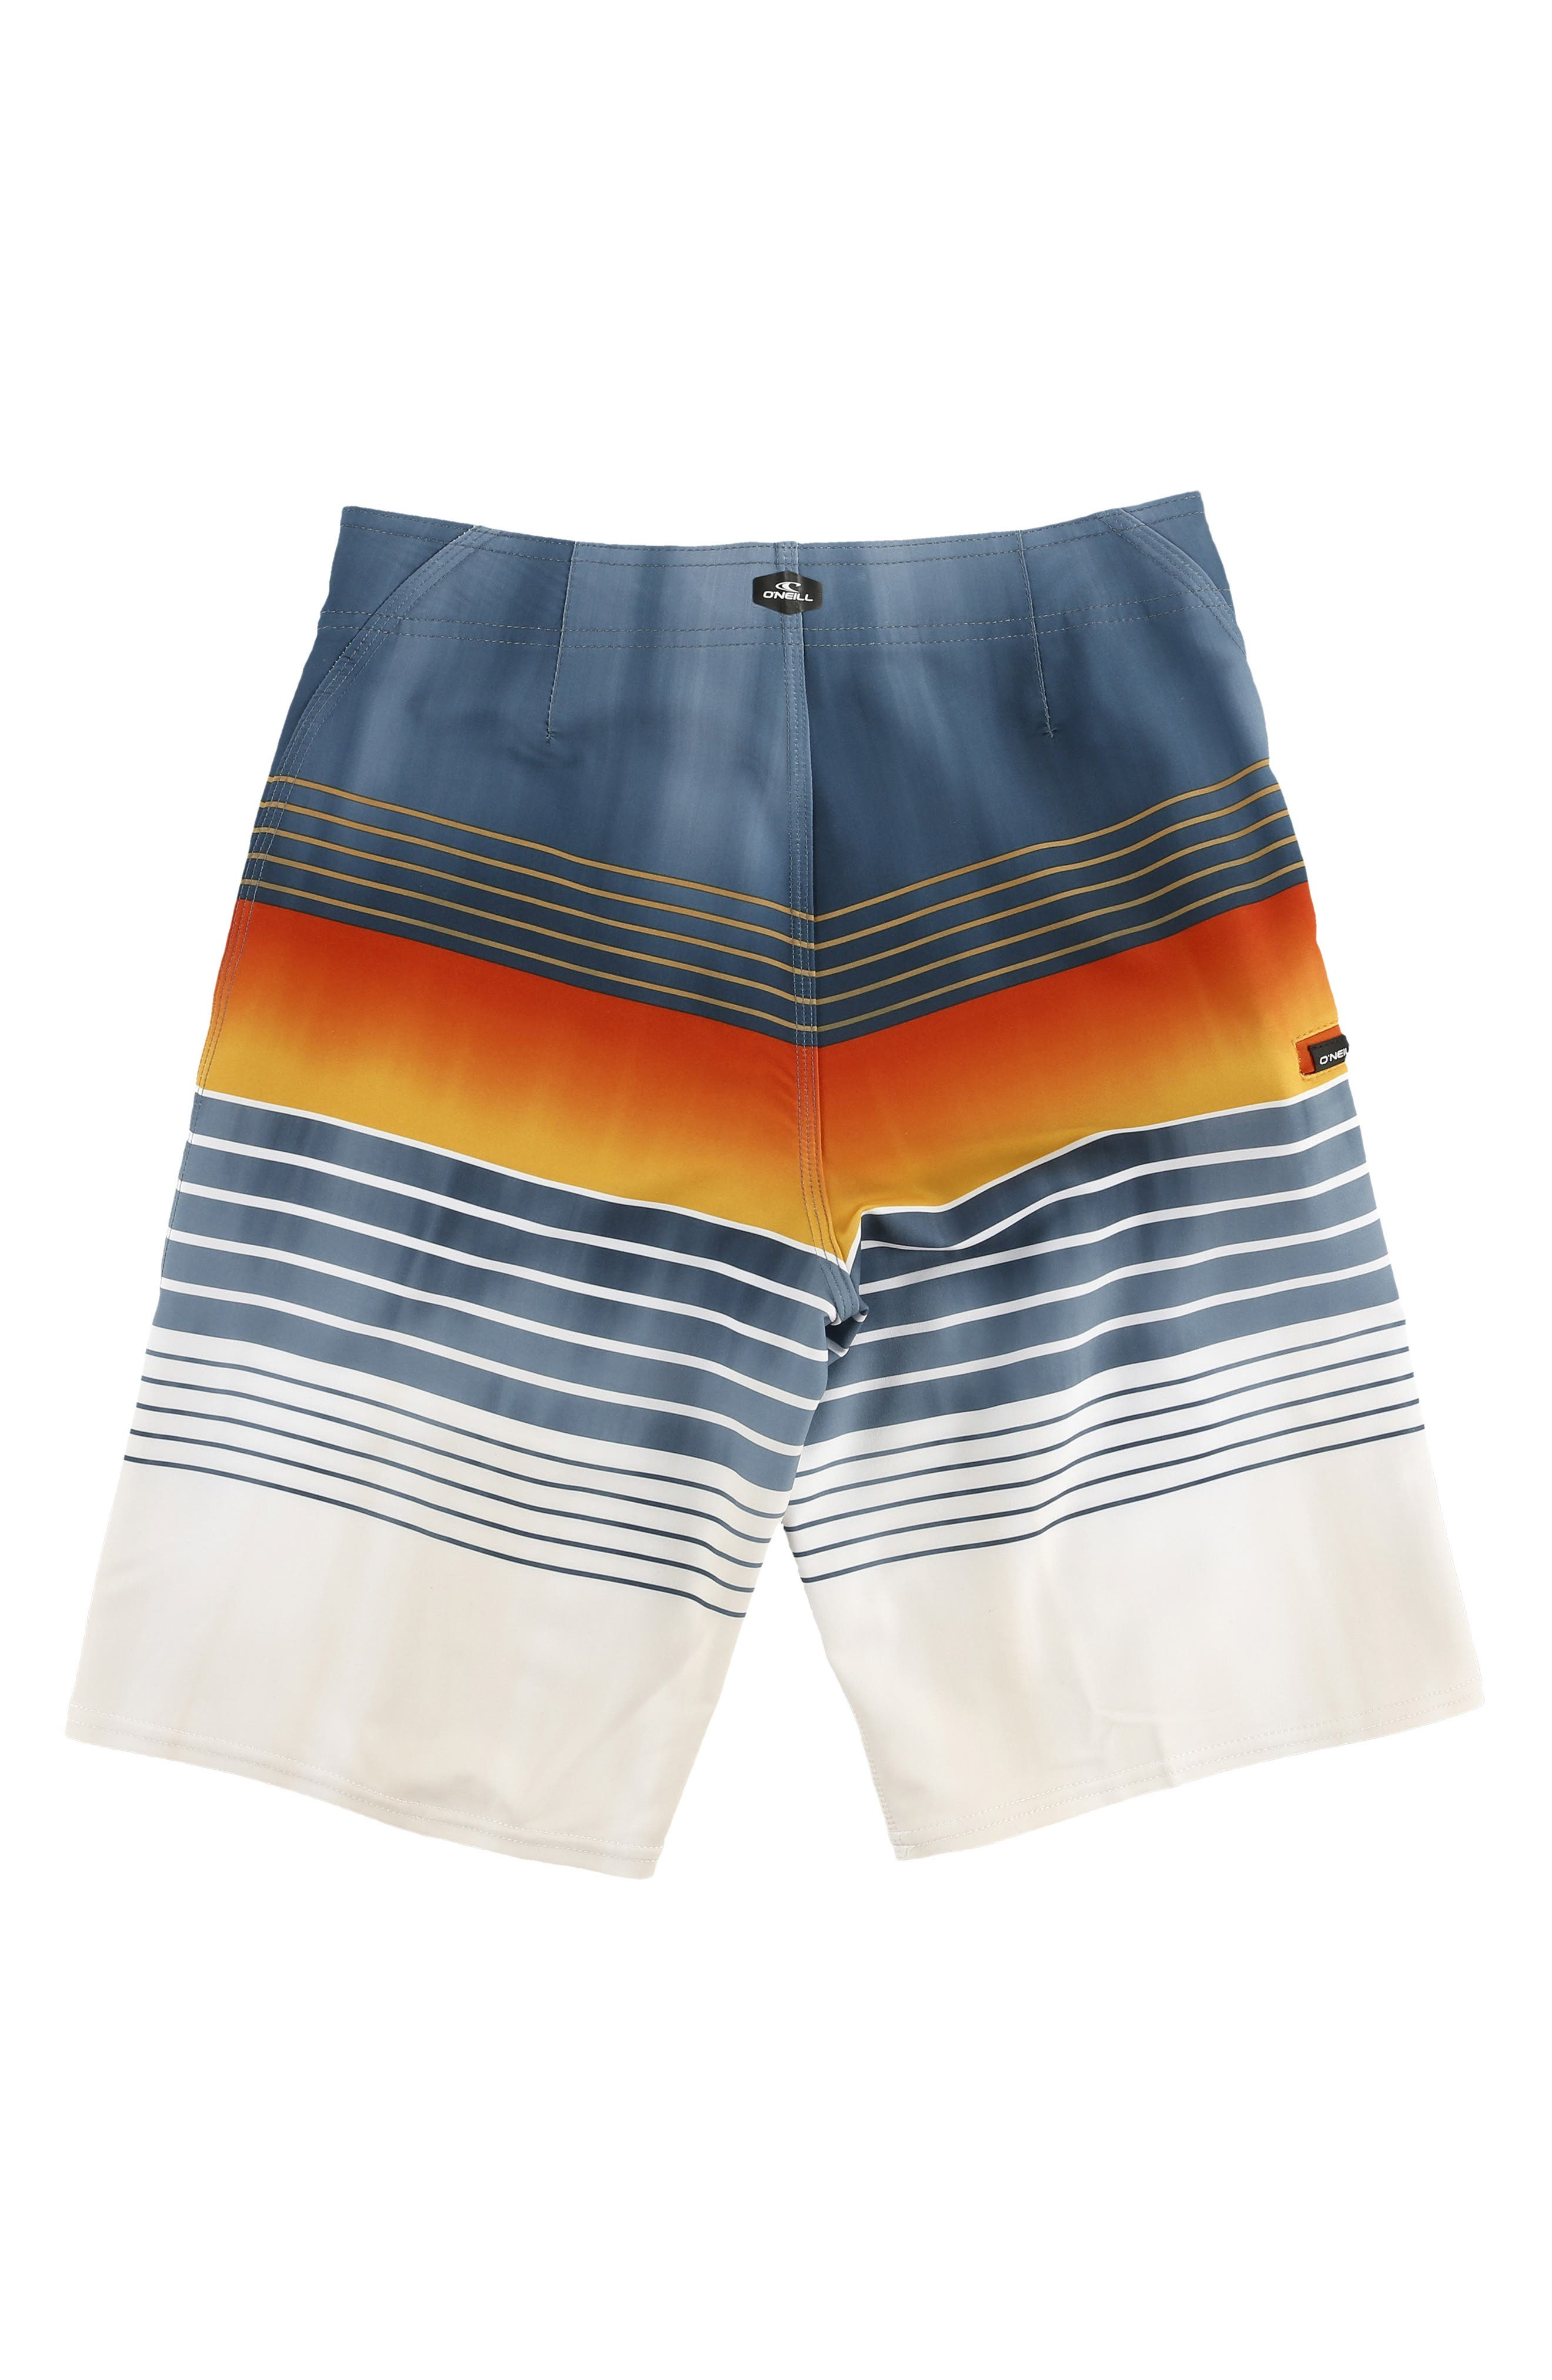 Hyperfreak Heist Board Shorts,                             Alternate thumbnail 2, color,                             DUST BLUE